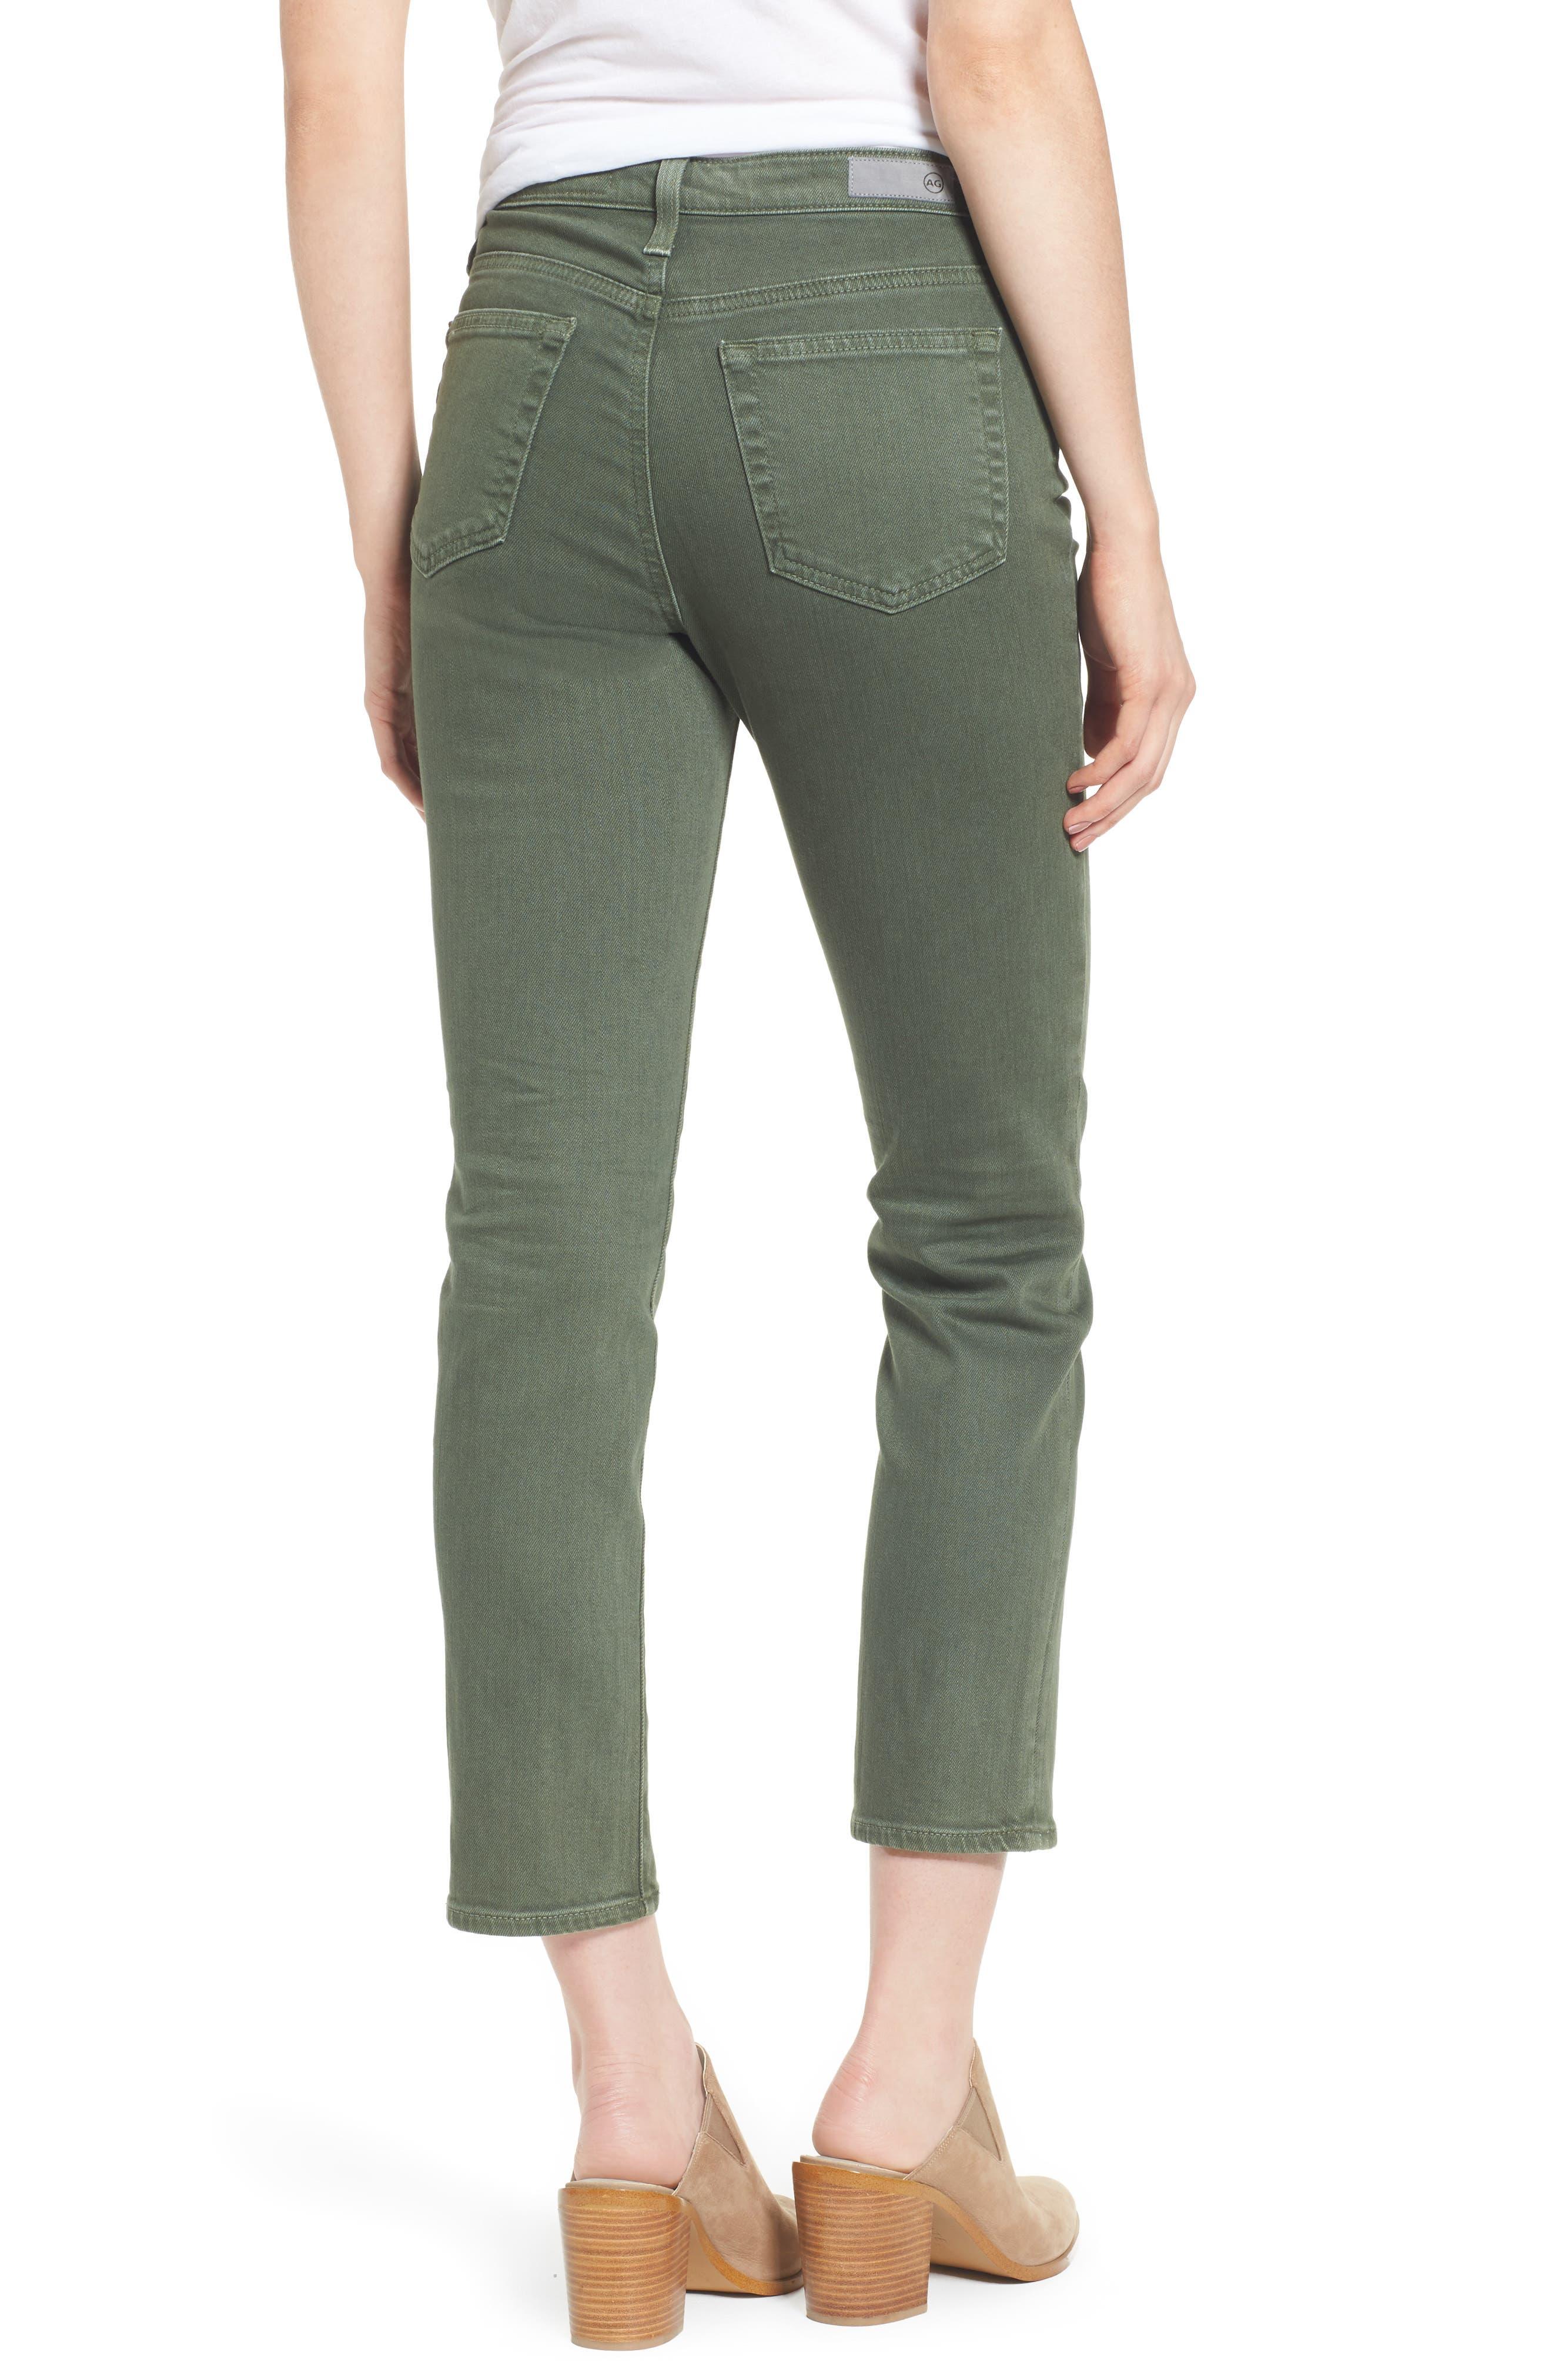 The Isabelle High Waist Crop Straight Leg Jeans,                             Alternate thumbnail 2, color,                             1 Year Sulfur Desert Pine